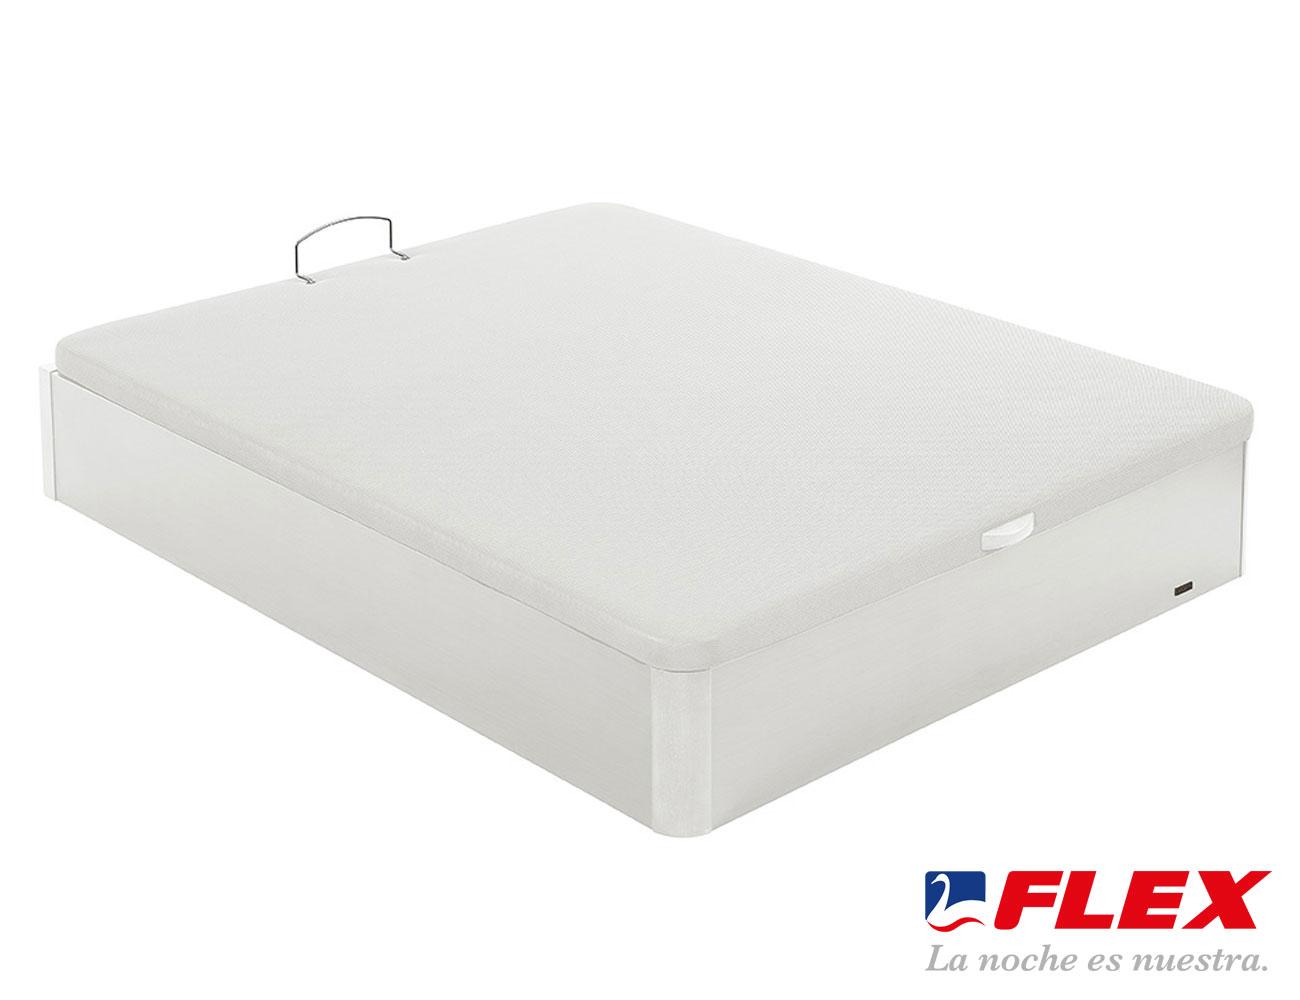 Canape flex abatible blanco 2